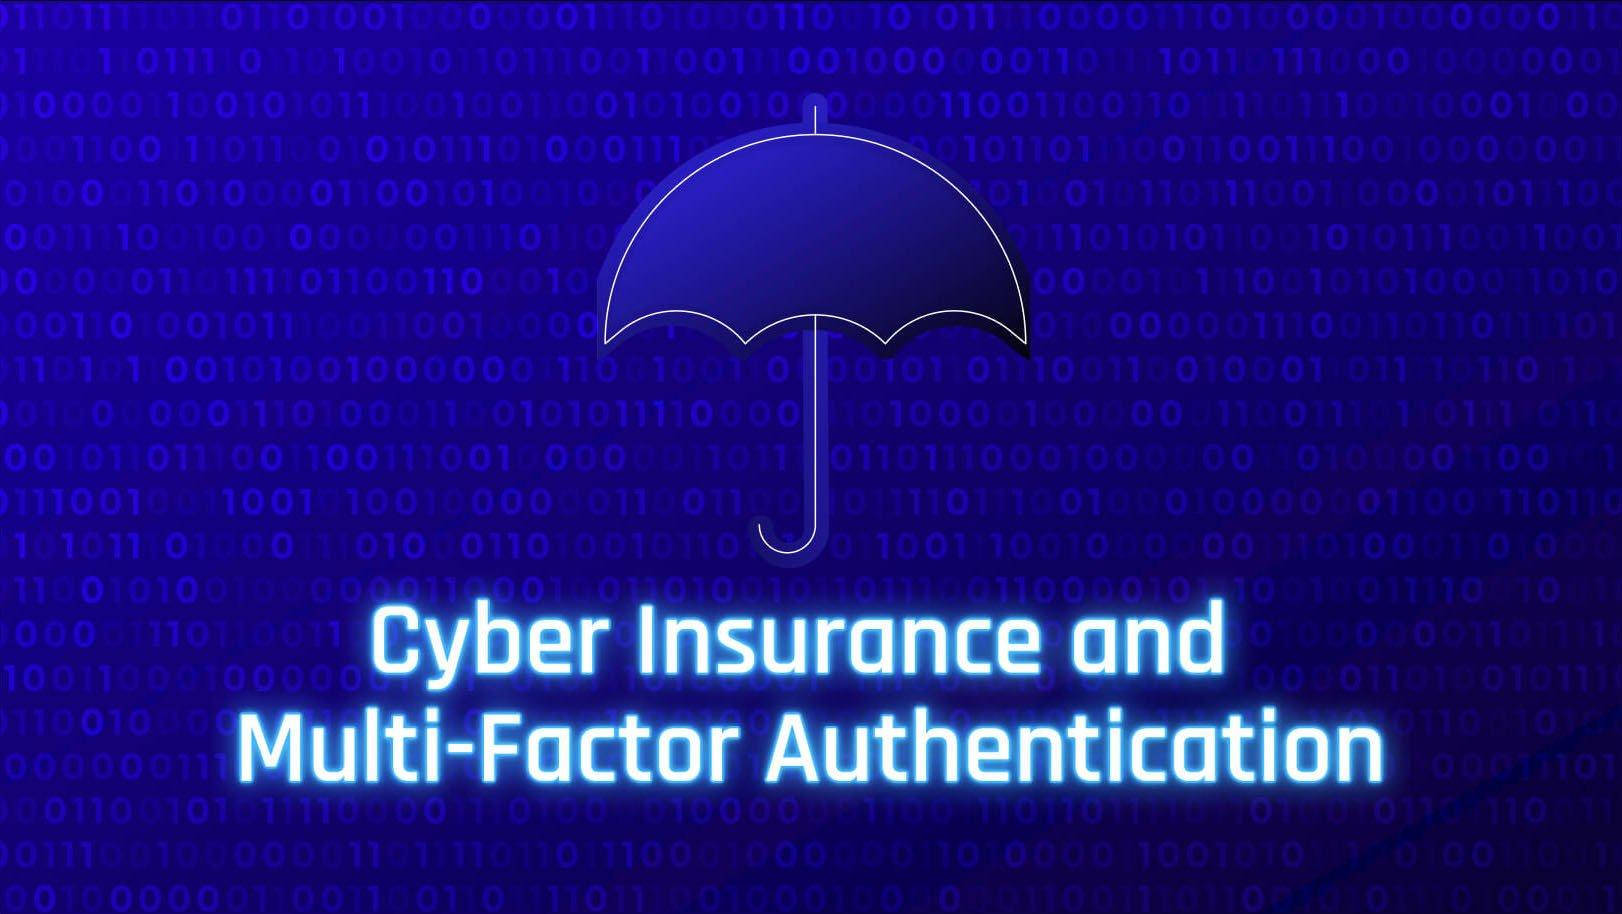 Meeting the Cyber Insurance MFA Mandate